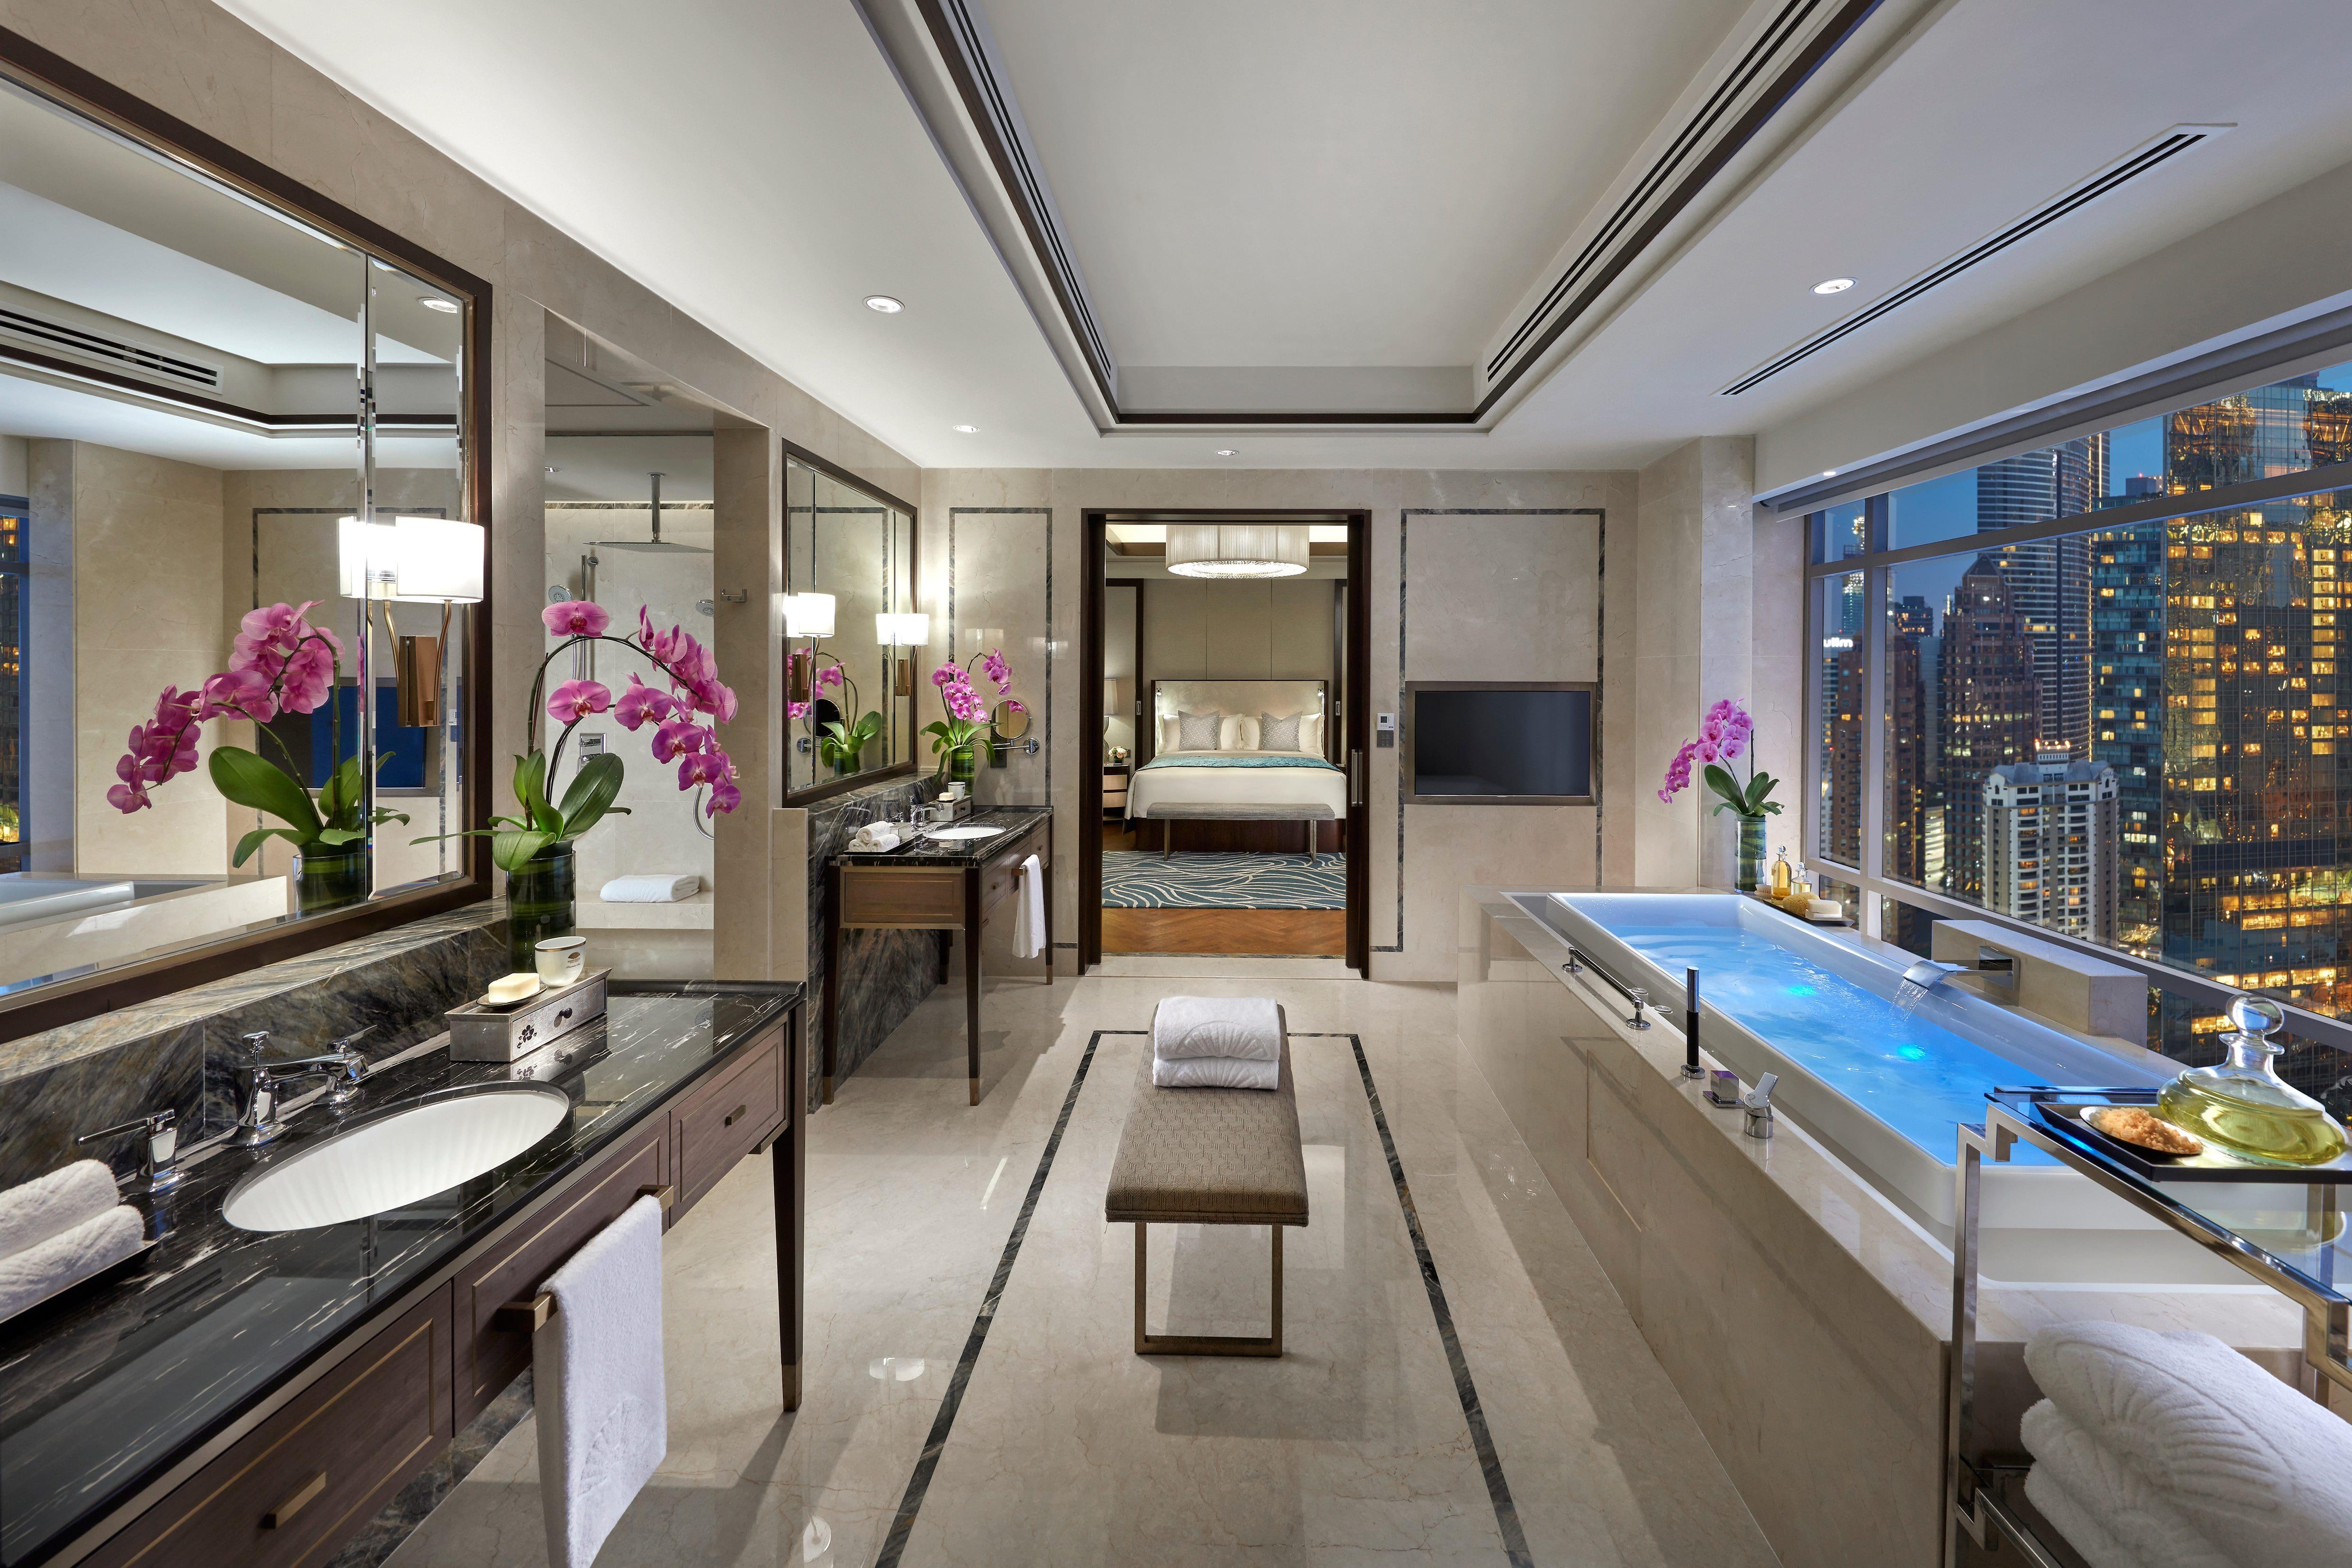 Bathroom of presidential suite at Mandarin Oriental, Kuala Lumpur